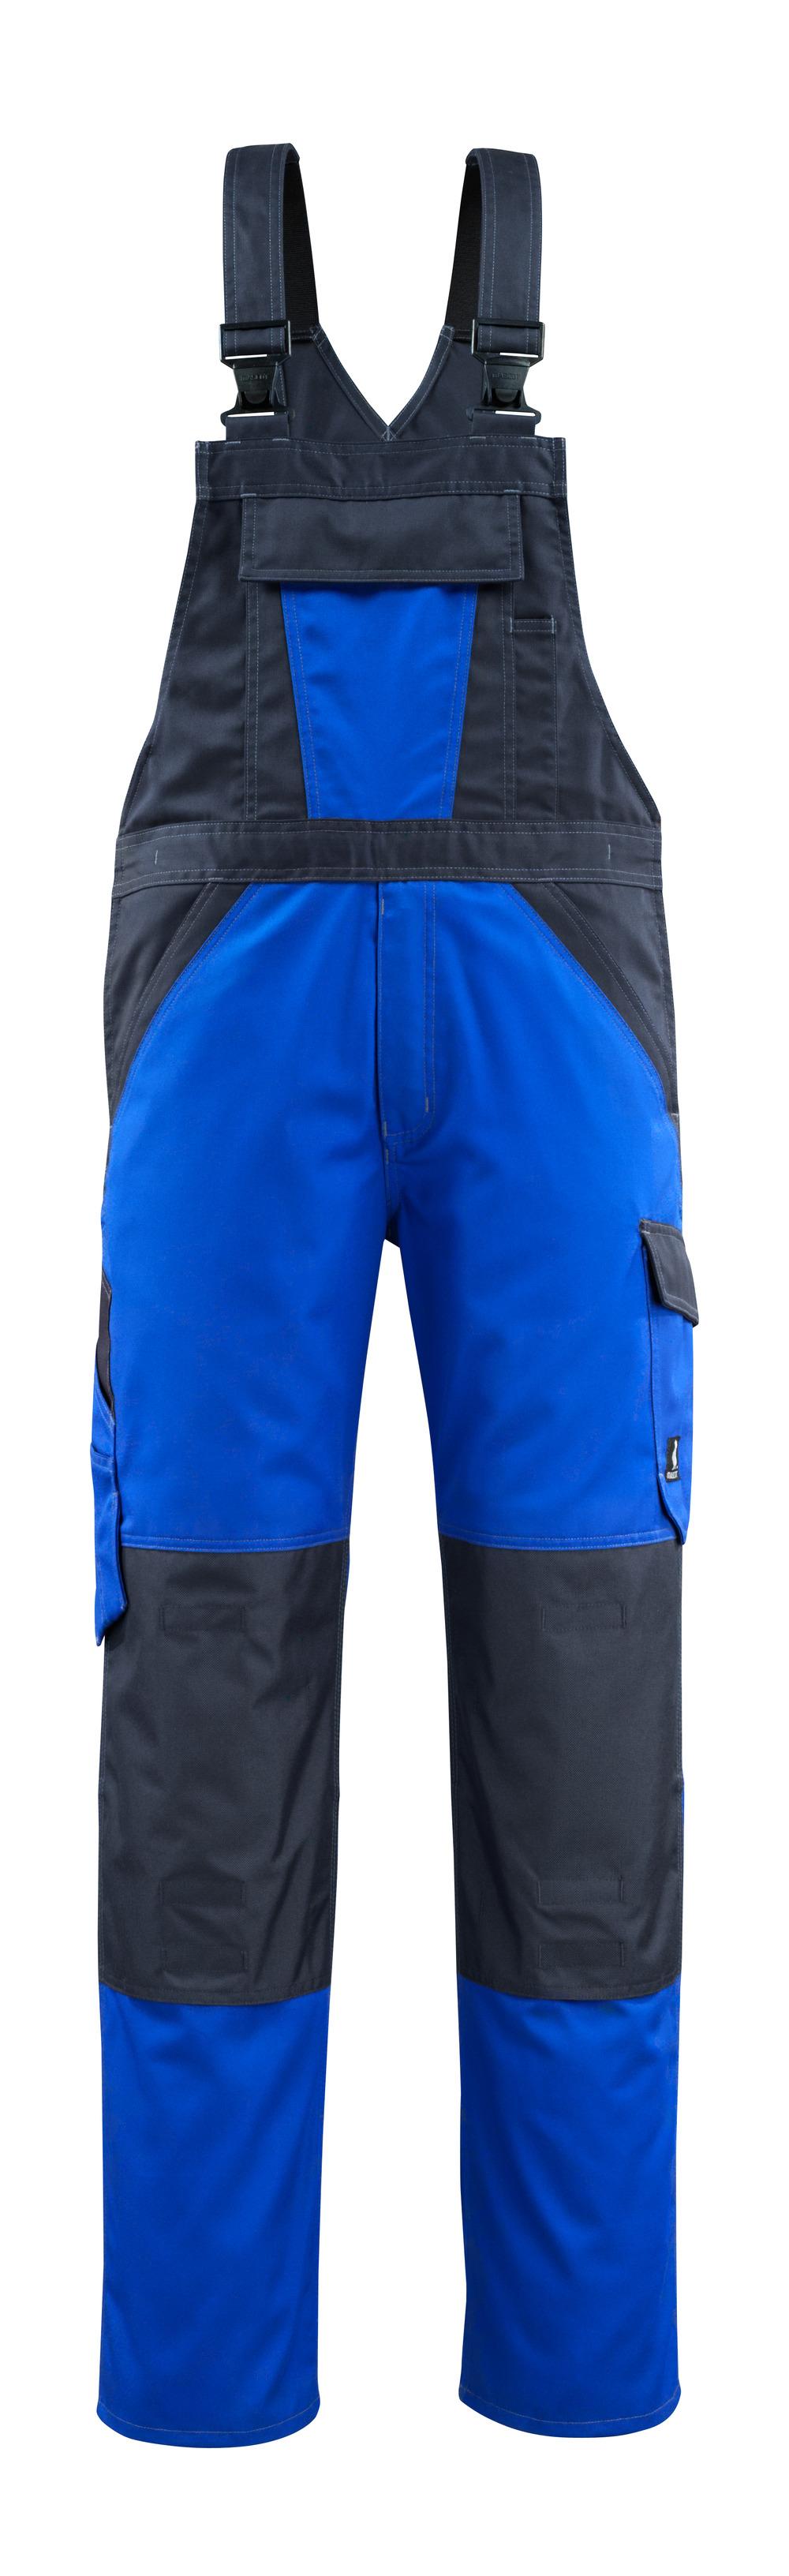 15769-330-11010 Salopette con tasche porta-ginocchiere - blu royal/blu navy scuro